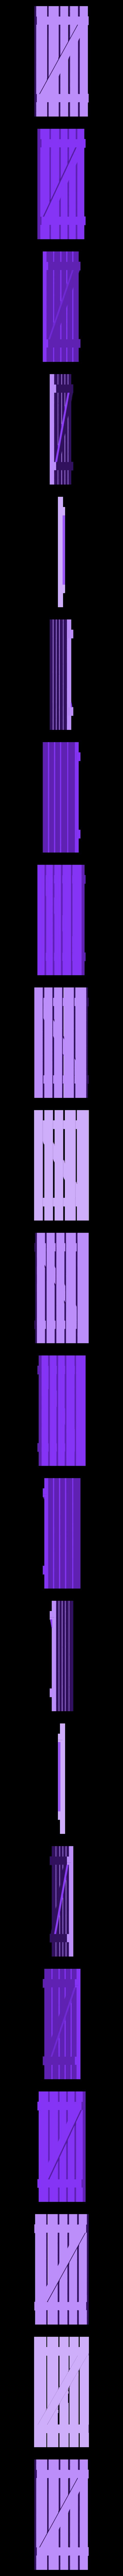 door1.stl Download free STL file The Crannog • 3D printable template, Earsling